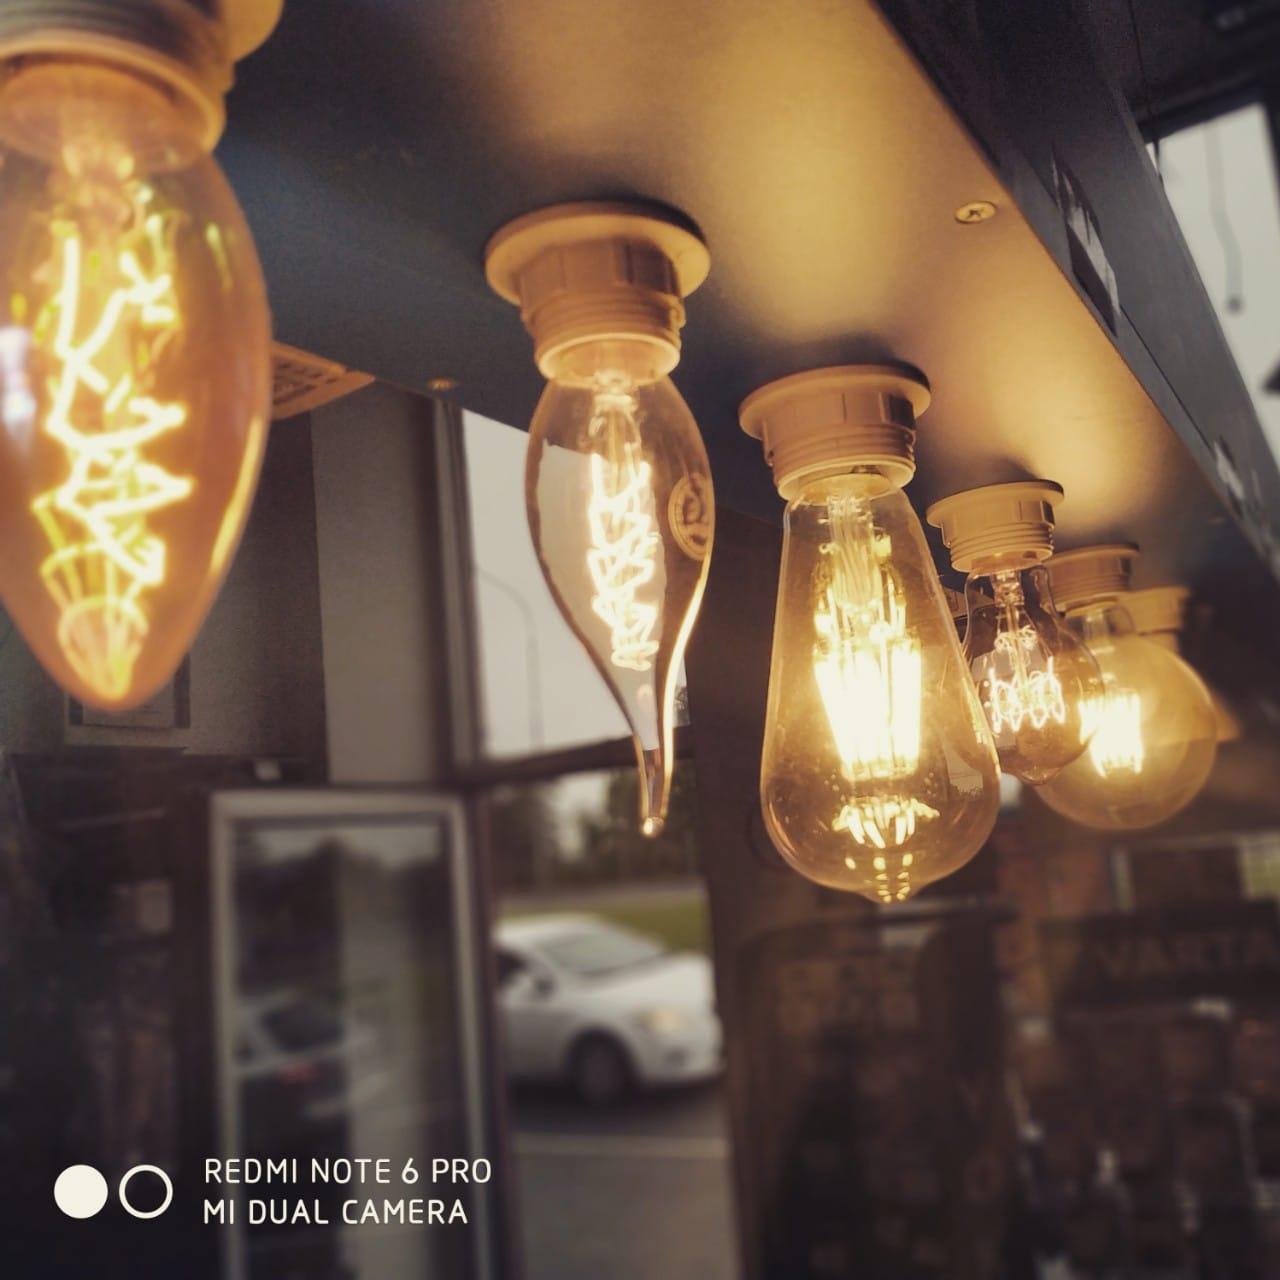 Veleprodaja i maloprodaja elektro-materijala Orthodoxa Company